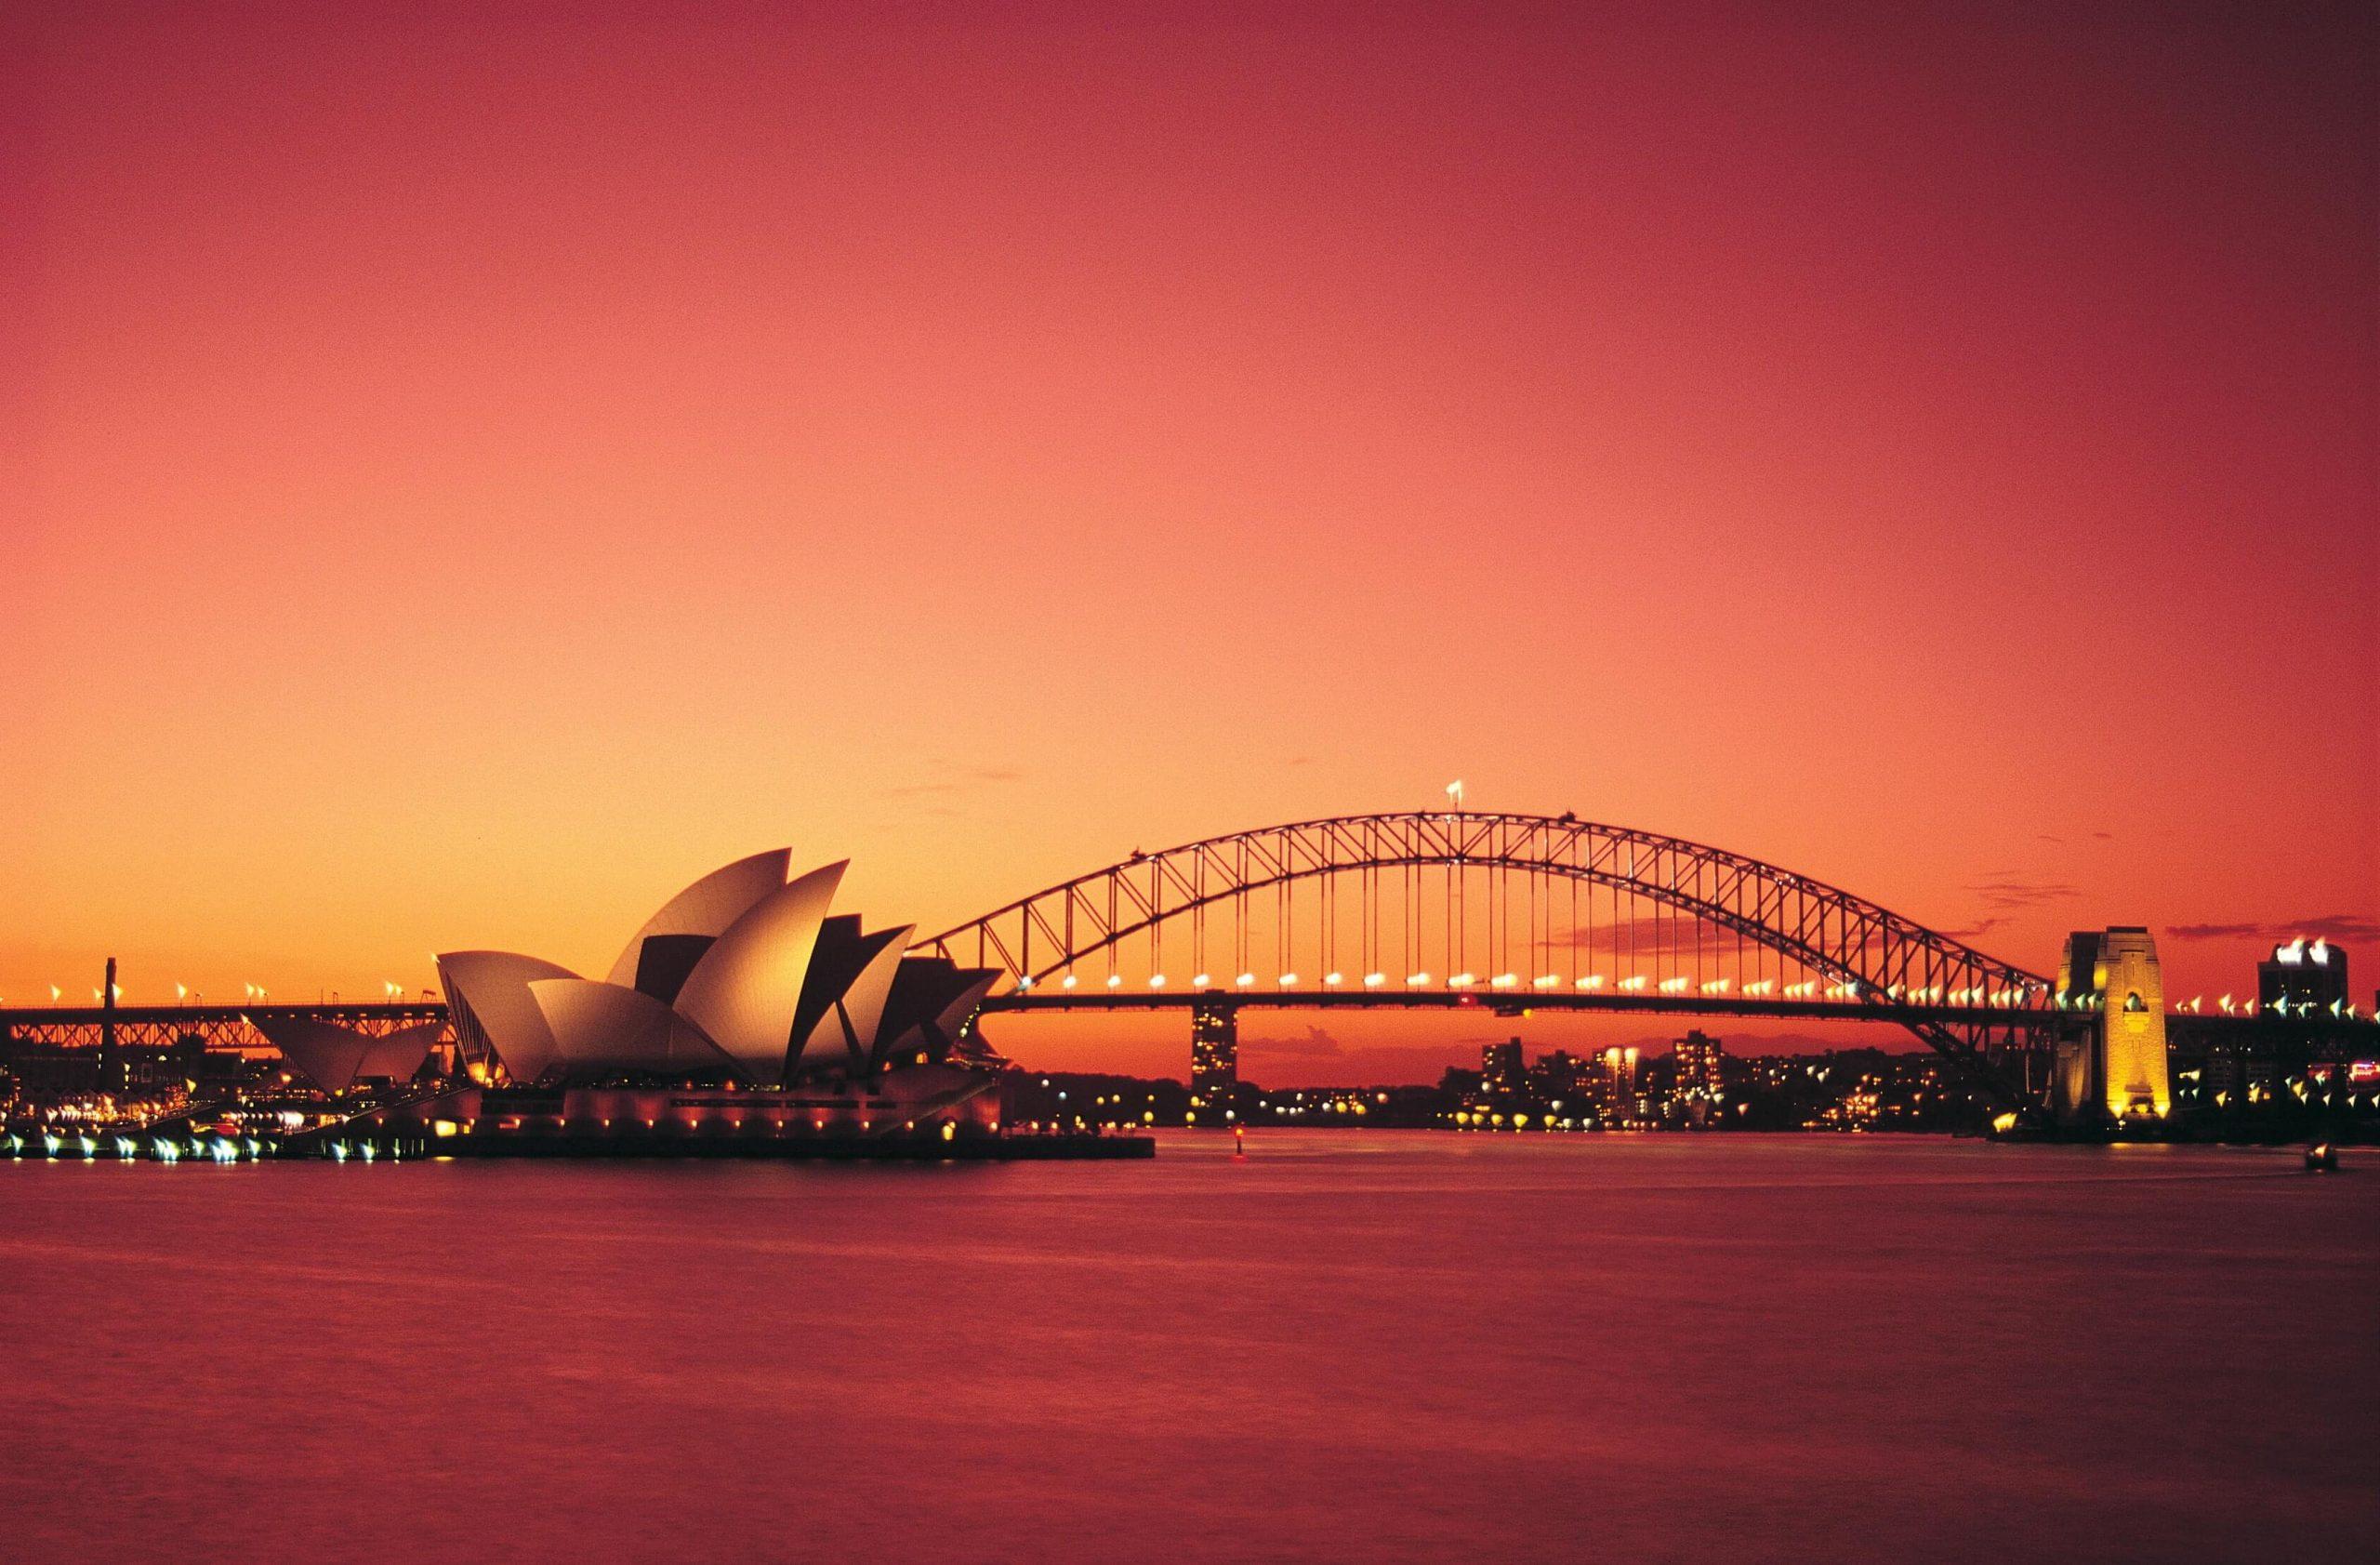 Sydney Harbour Bridge and Opera House at sunset